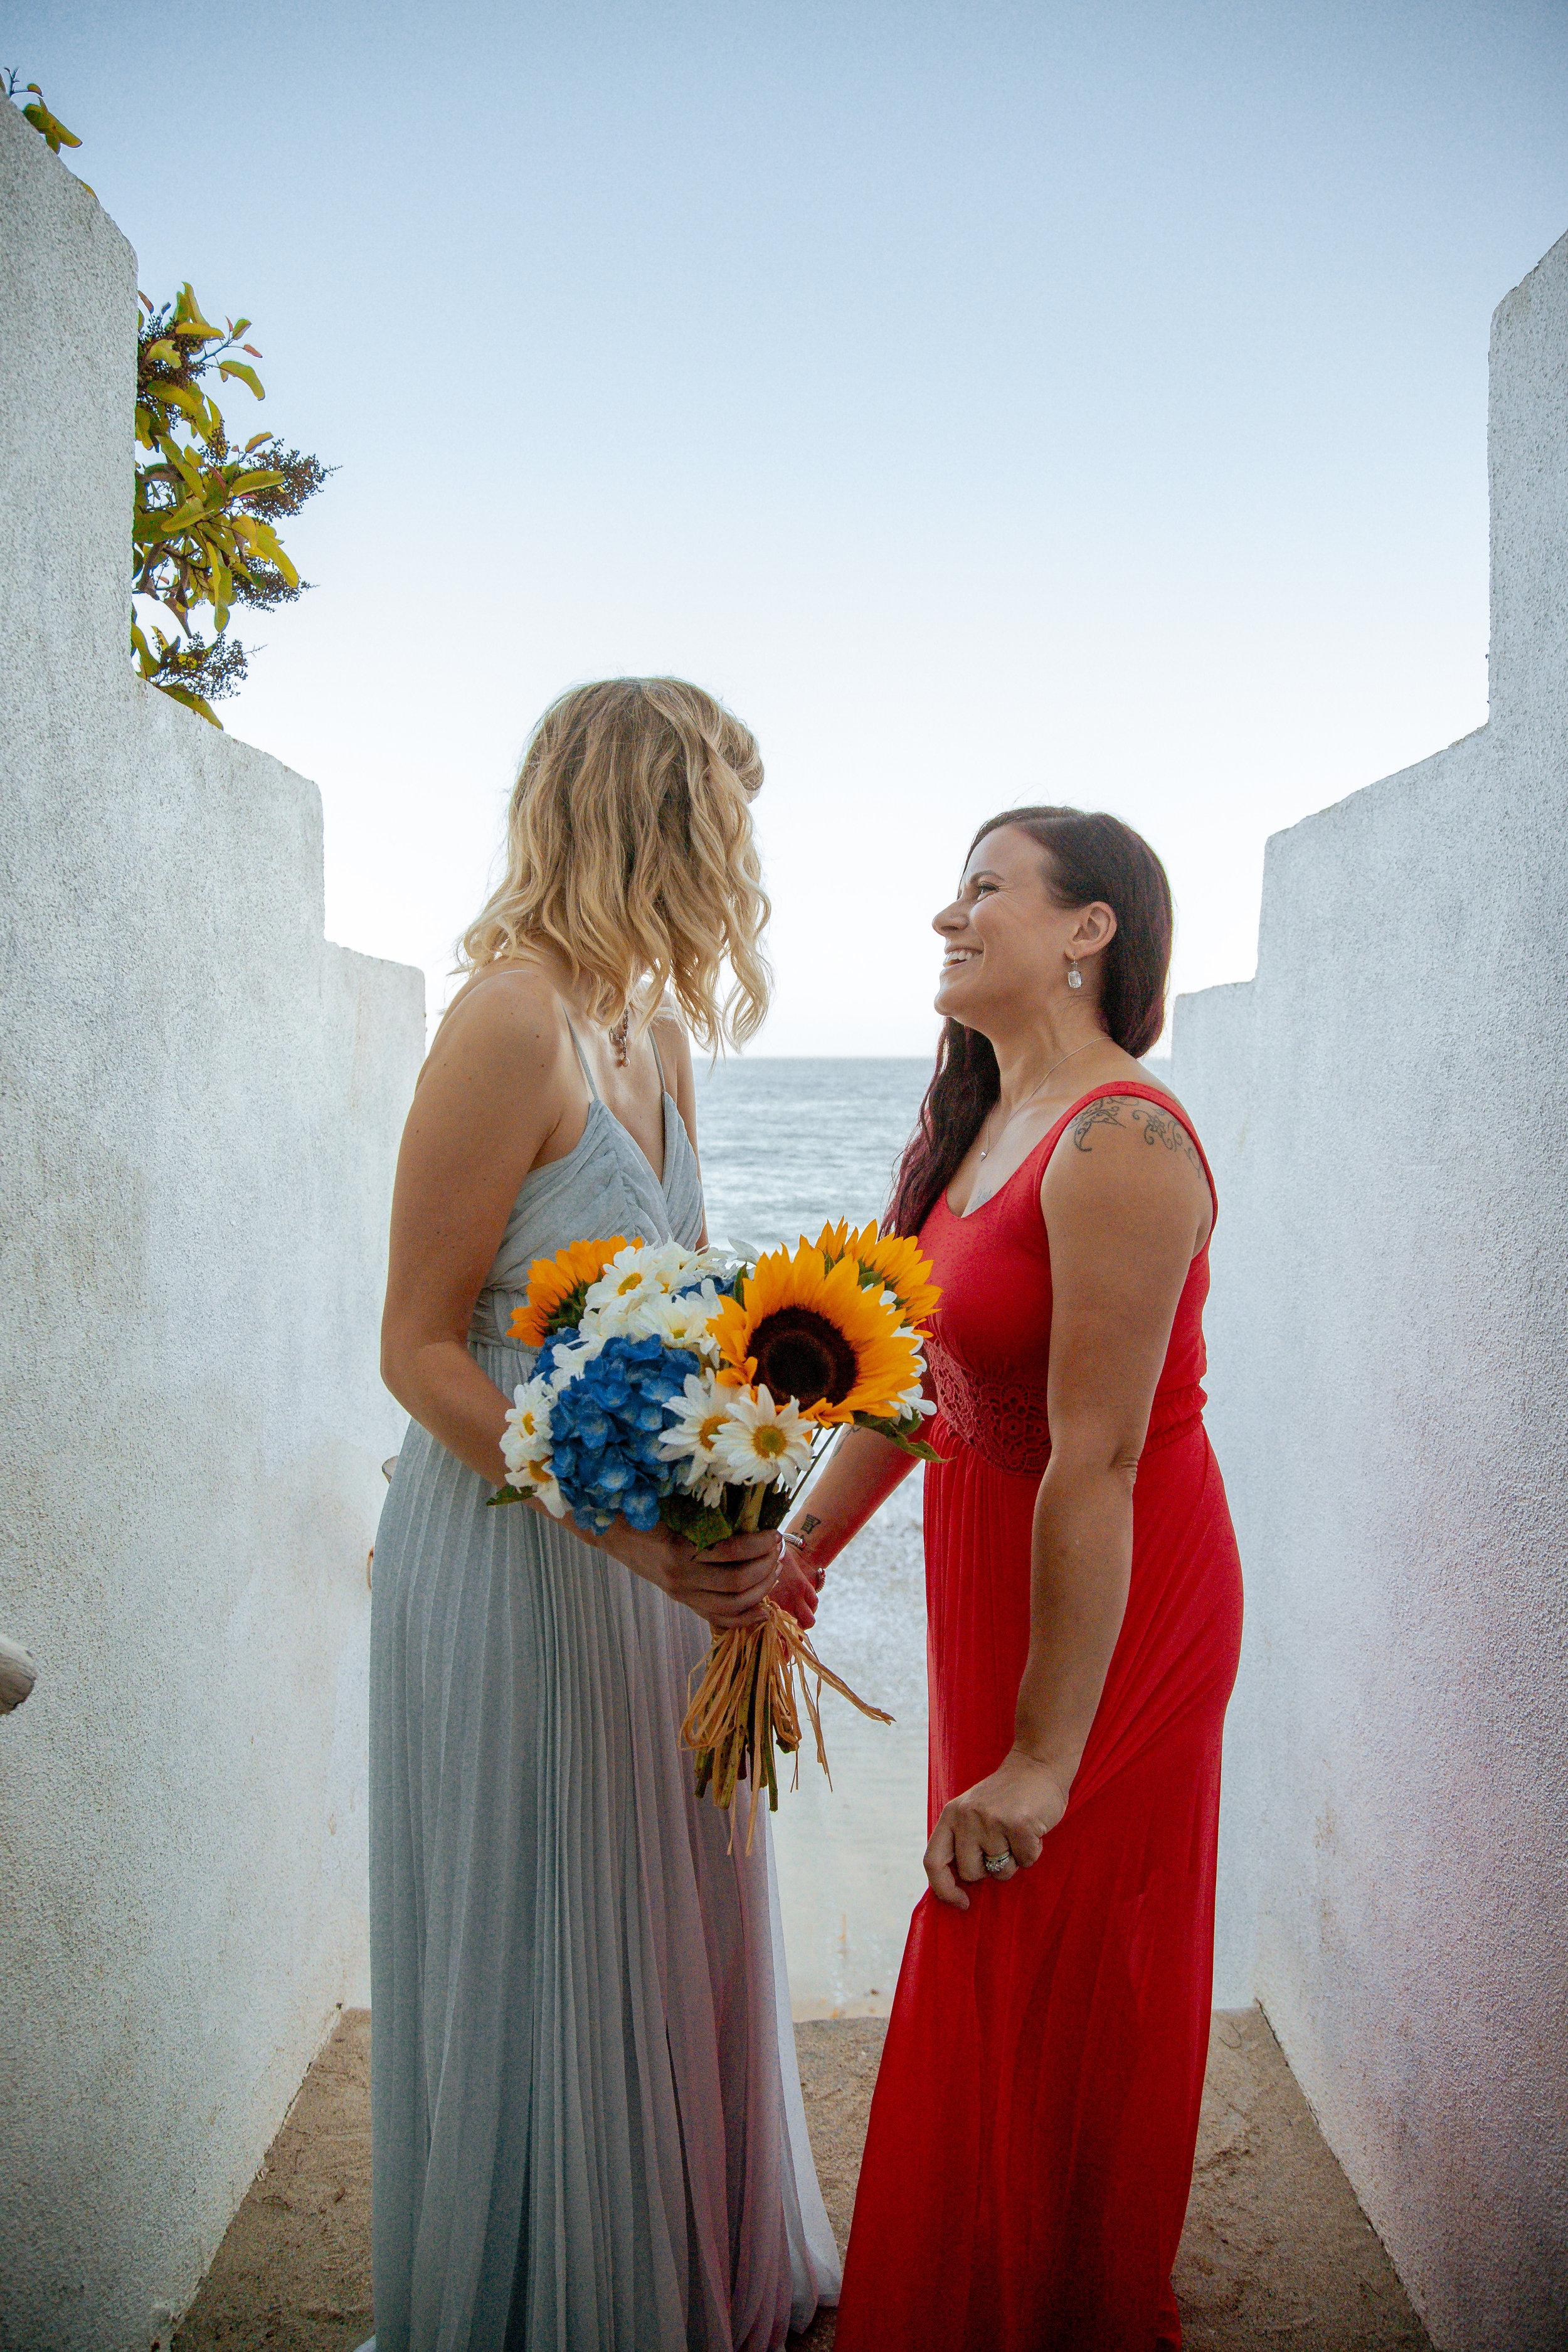 Hannah_&_Kates_Wedding_Oct_5th_2018_0_21.JPG